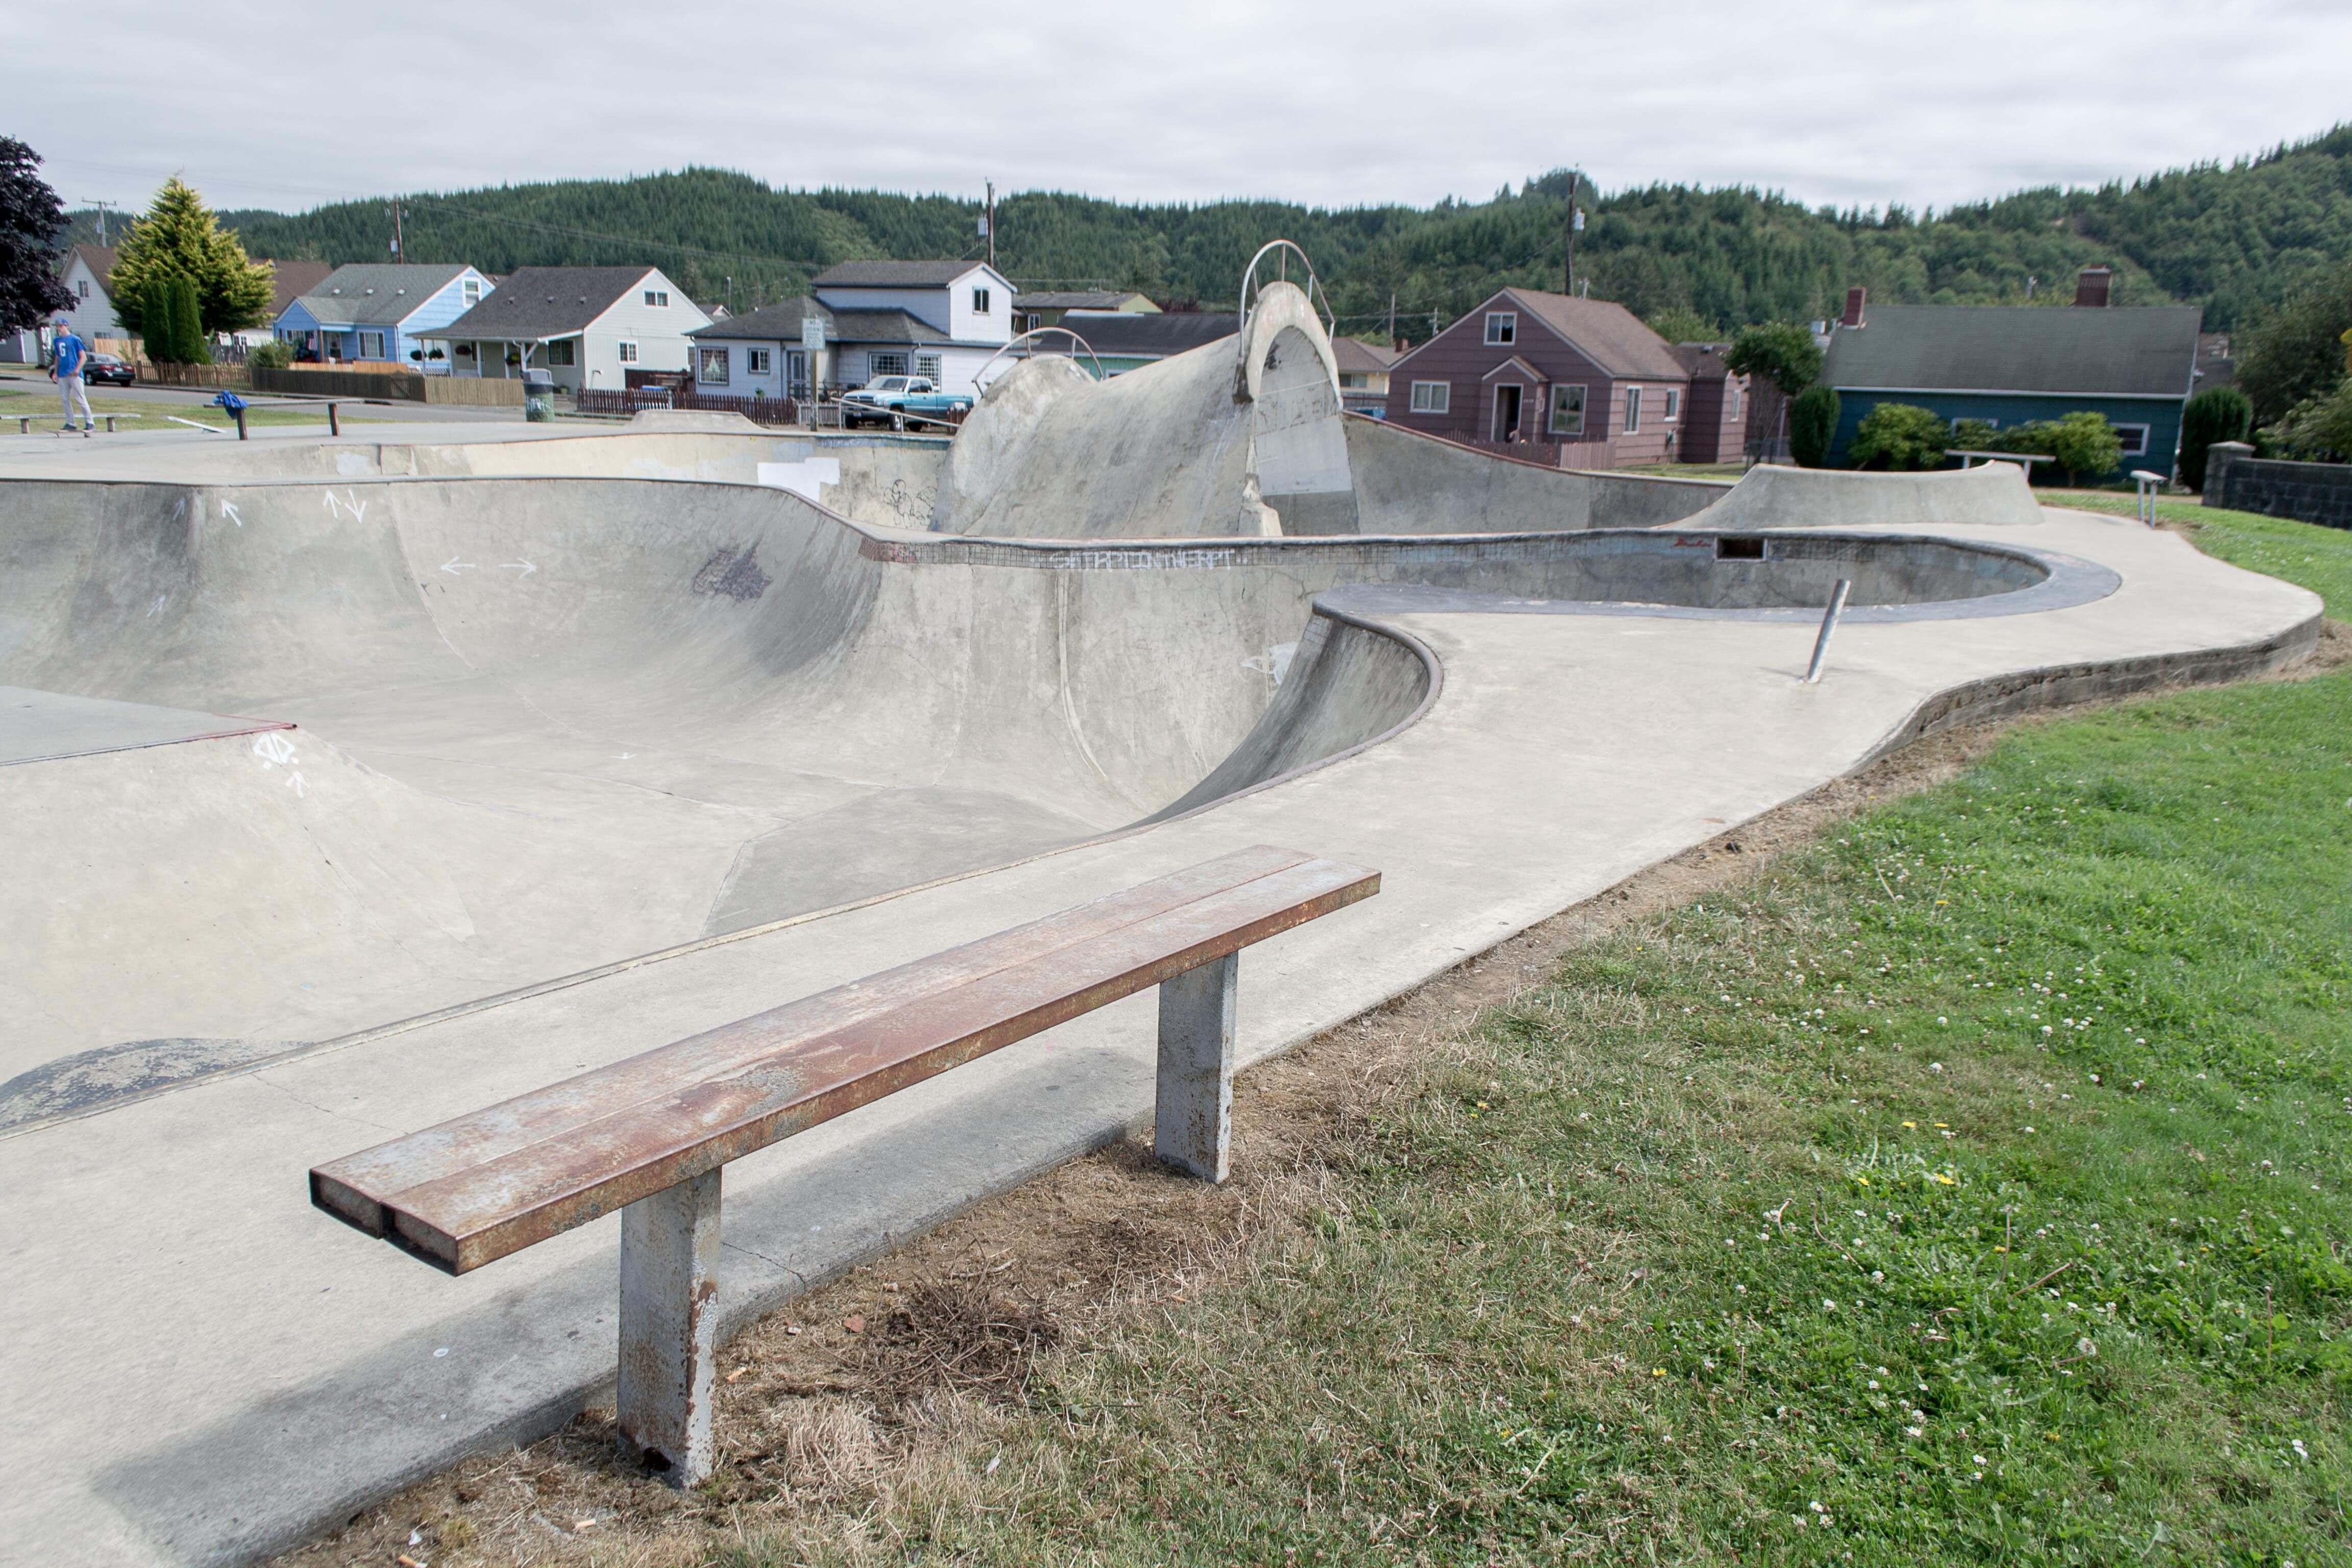 reedsport skatepark, reedsport, oregon